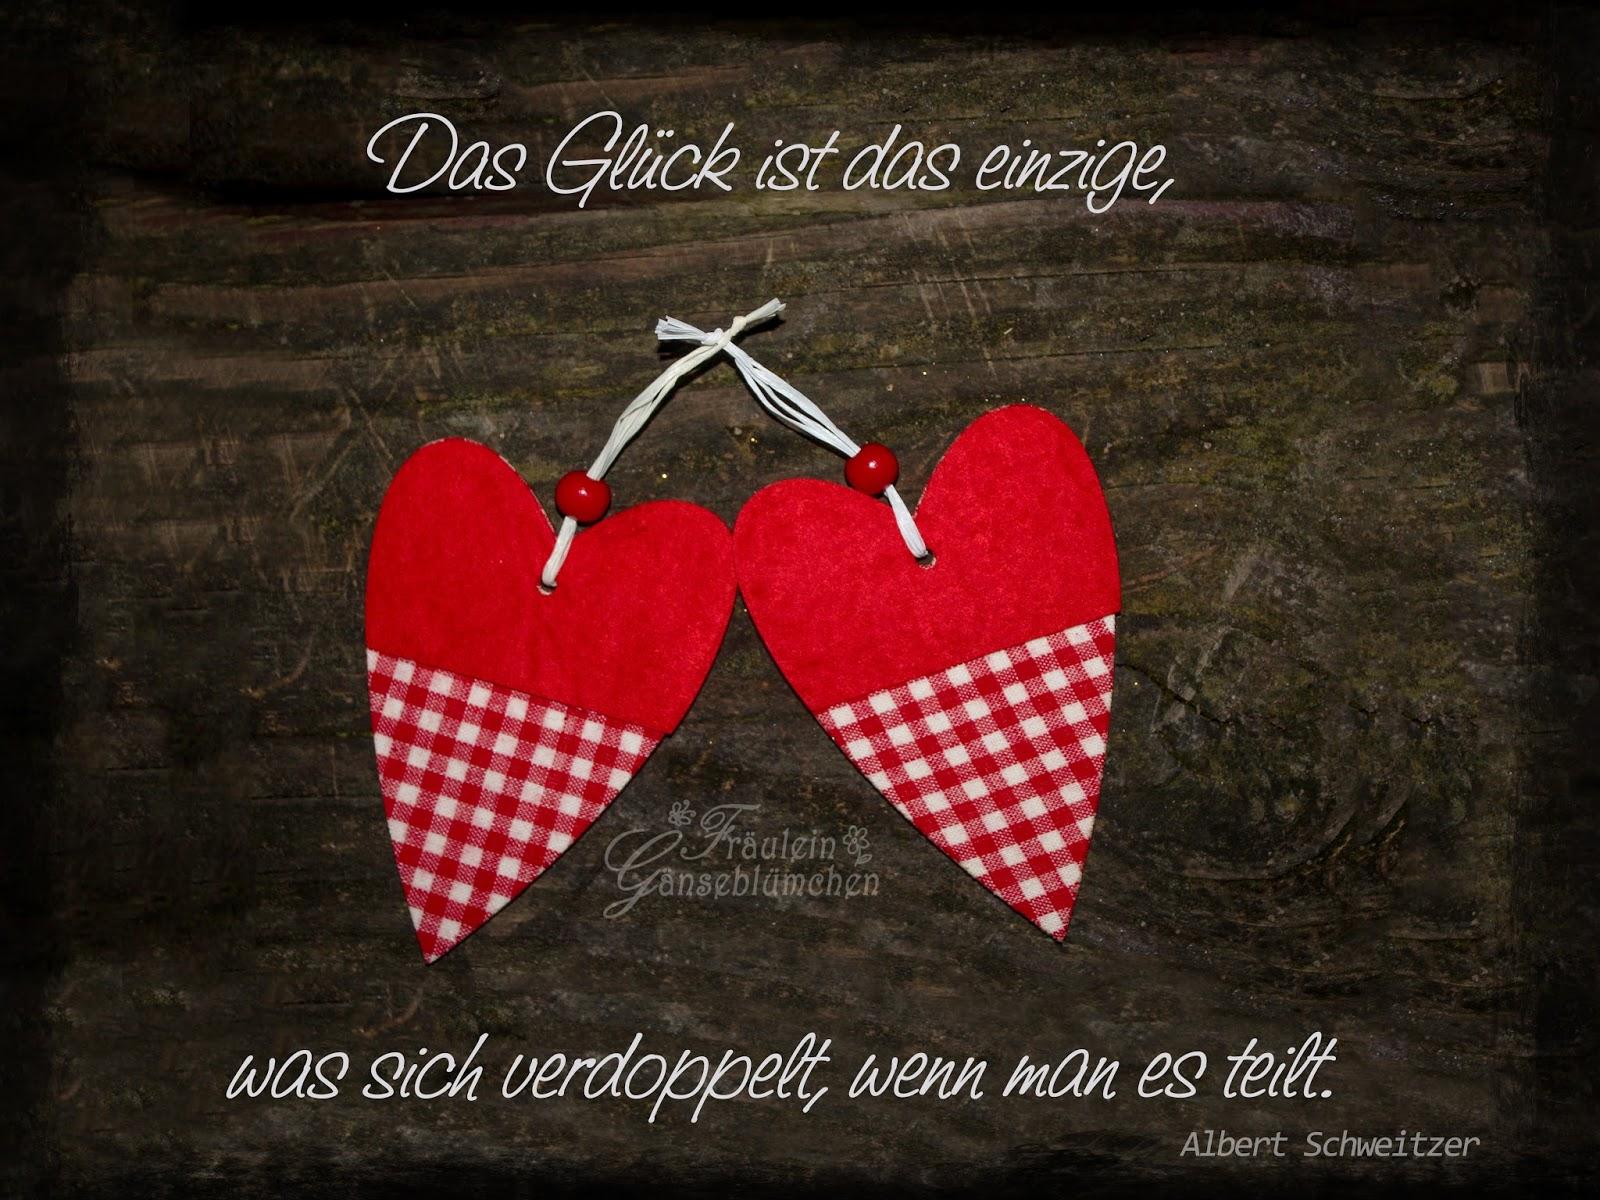 Fräulein Gänseblümchen Advents Special 18